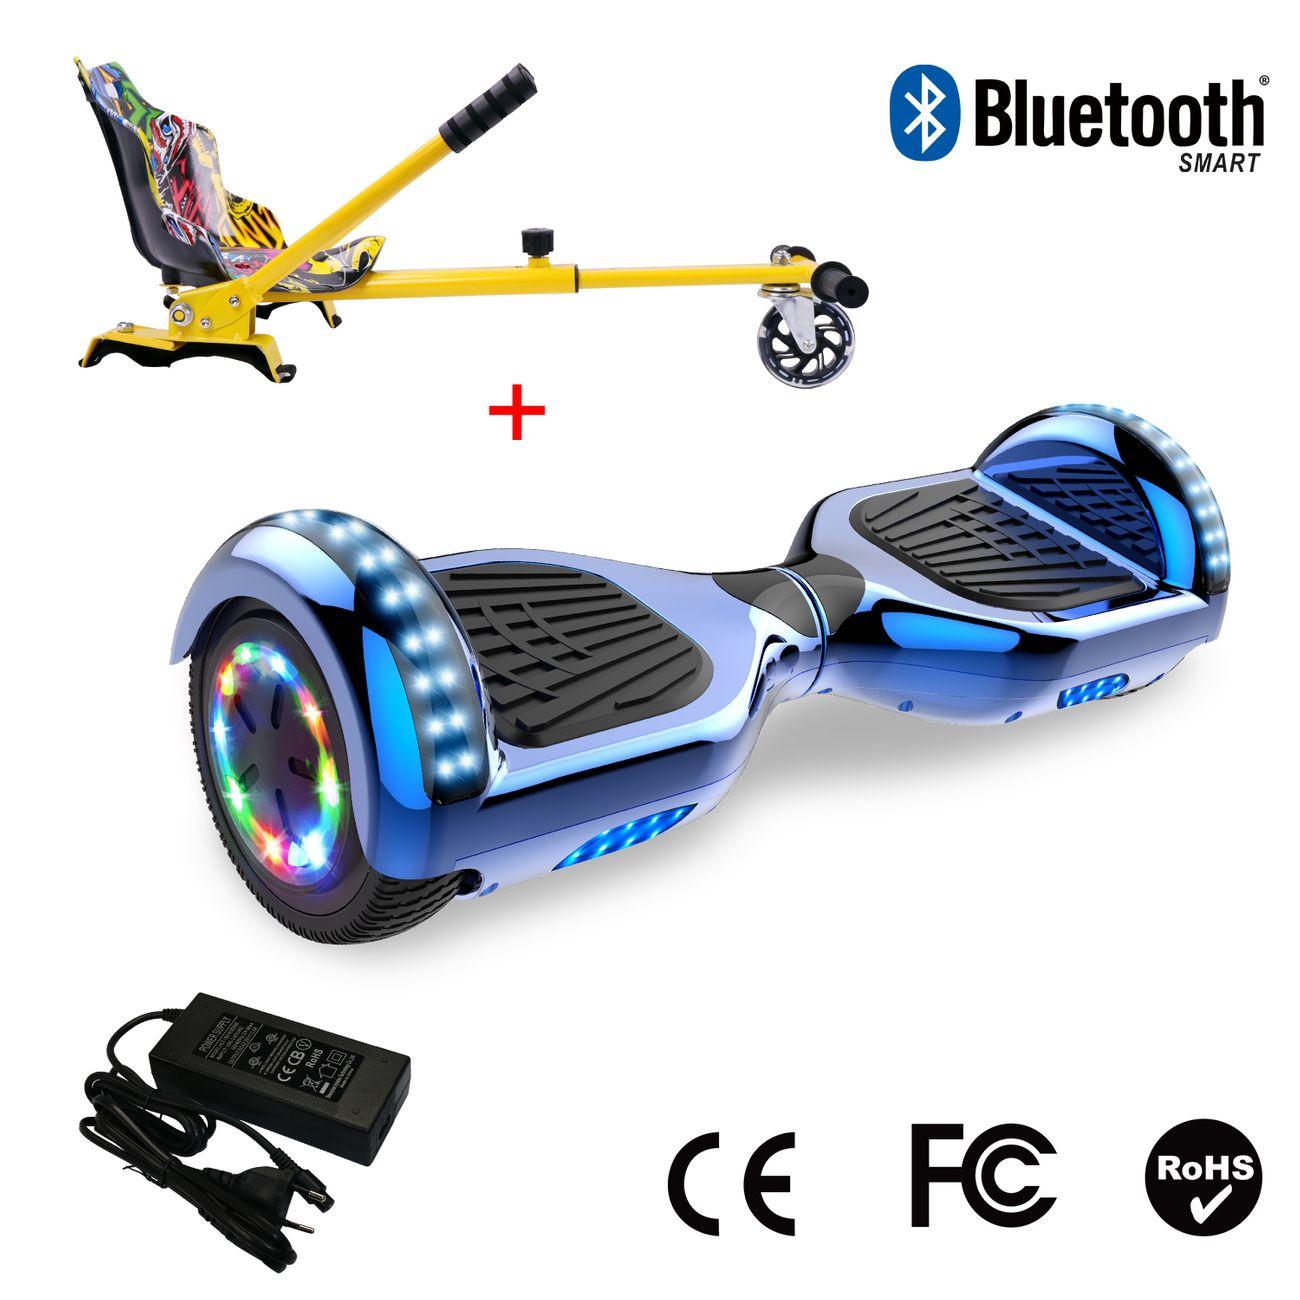 Glisse urbaine  COOL&FUN Cool&Fun Hoverboard 6.5 Pouces avec Bluetooth Bleu + Hoverkart Hip, Gyropode Overboard Smart Scooter certifié, Pneu à LED de couleur, Kit kart